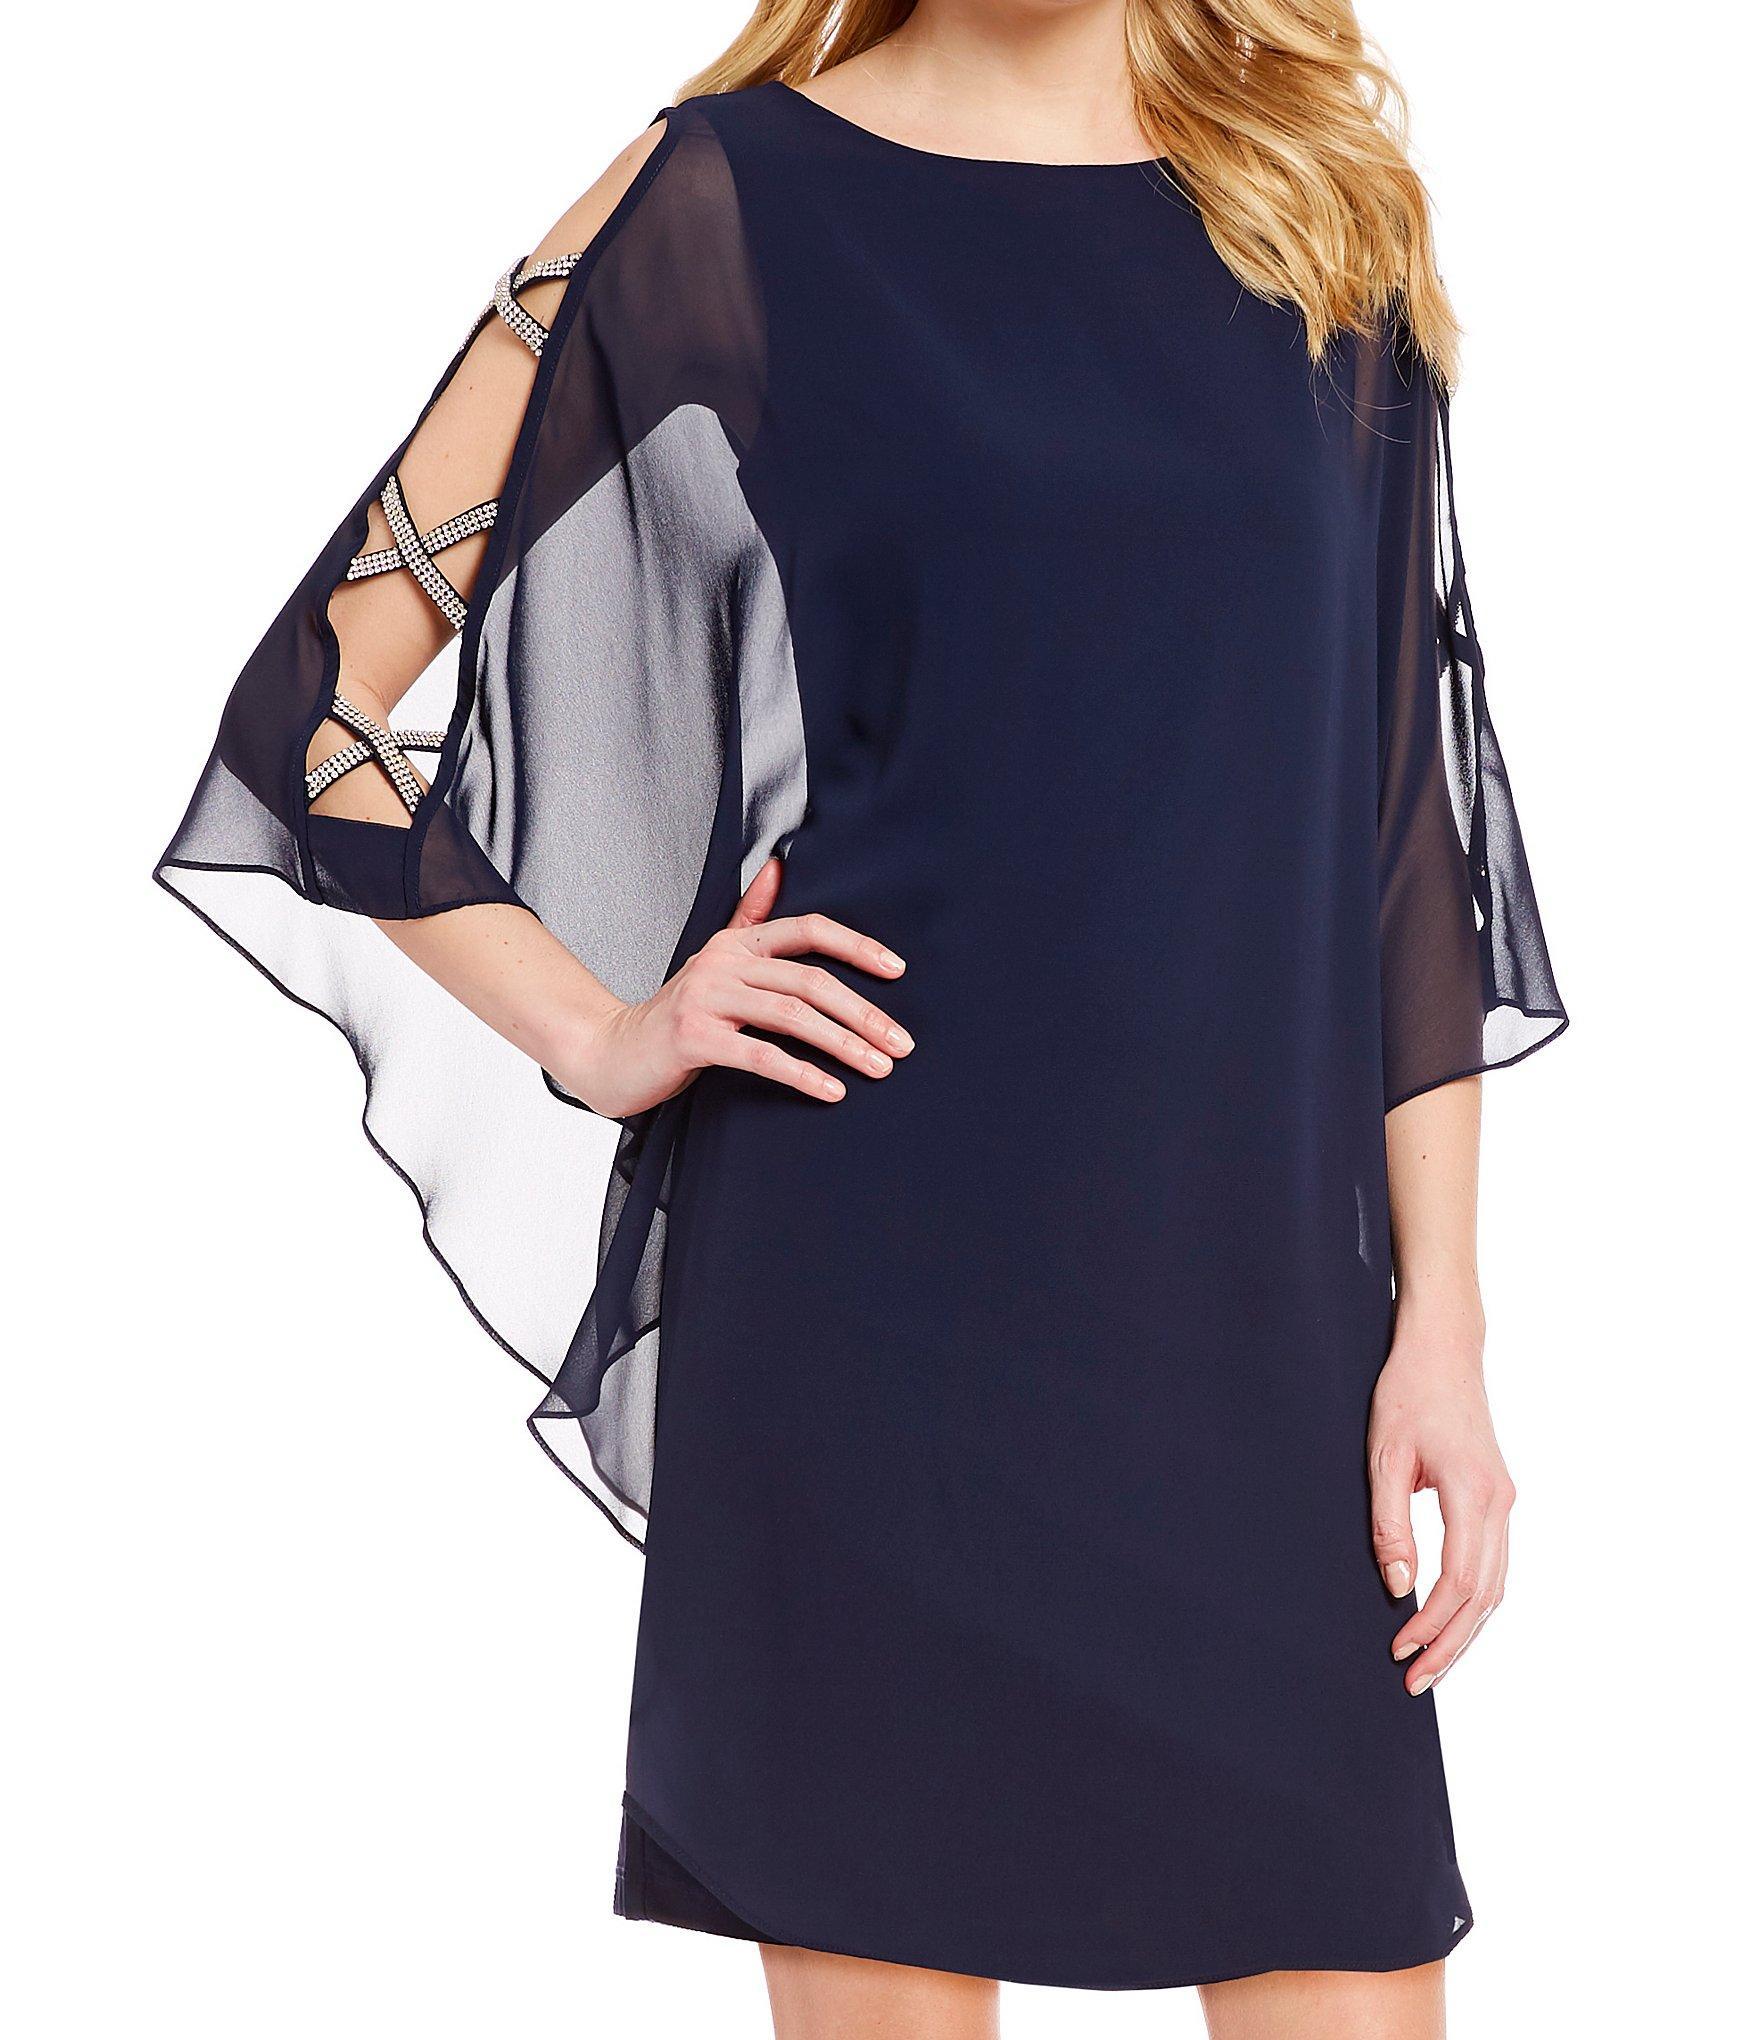 f941d15c795 Xscape - Blue Chiffon Cape Sleeve Sheath Dress - Lyst. View fullscreen